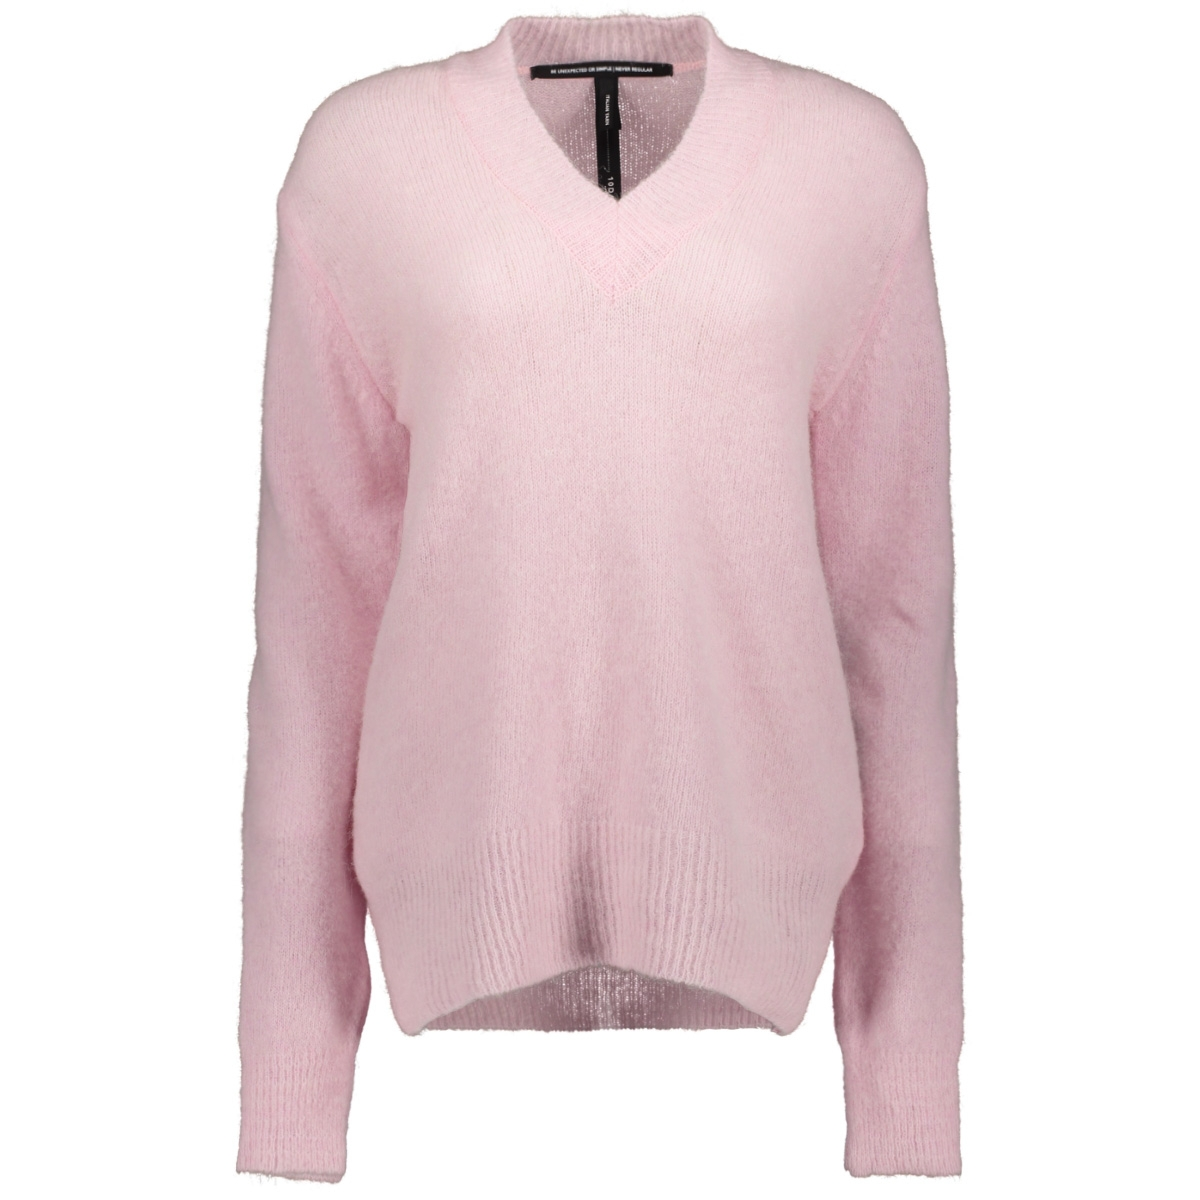 v neck sweater 20 607 9104 10 days trui 1064 light pink